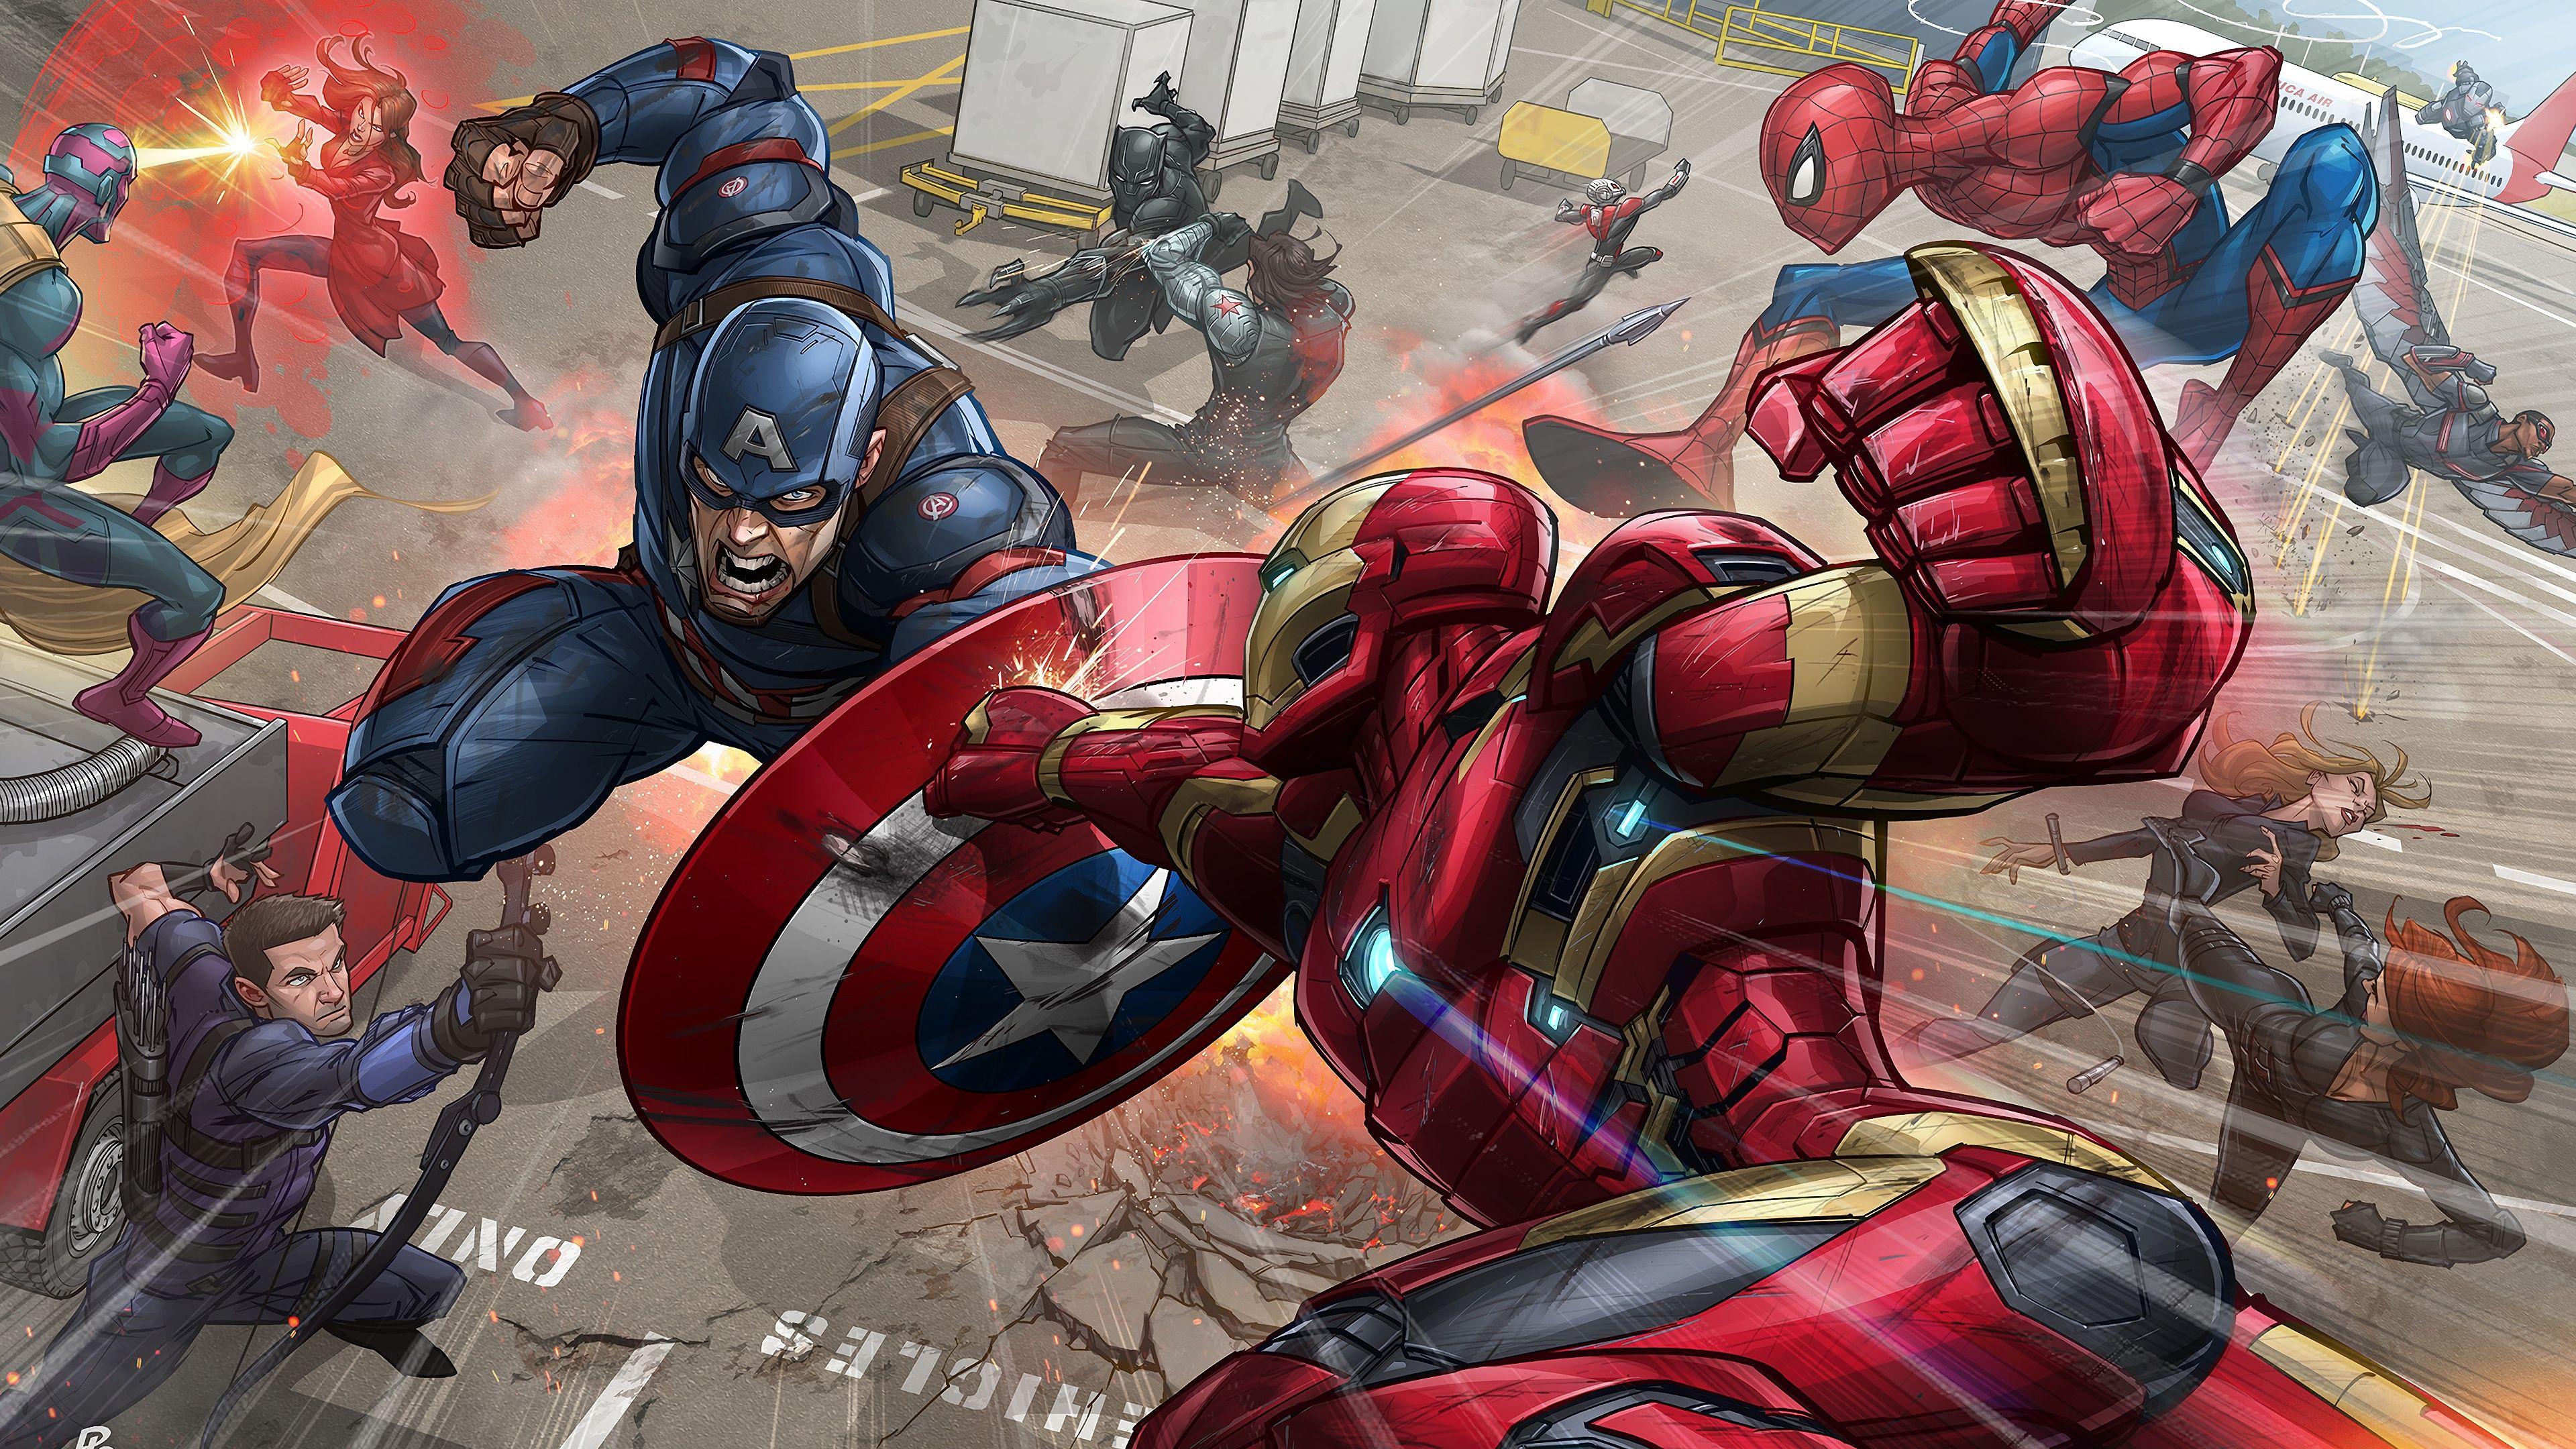 Iron Man Captain America Fight Marvel Comics 4k Wallpaper Marvel Comics Iron Man Comics Captain America Captain America Civil War Civil War Art Marvel